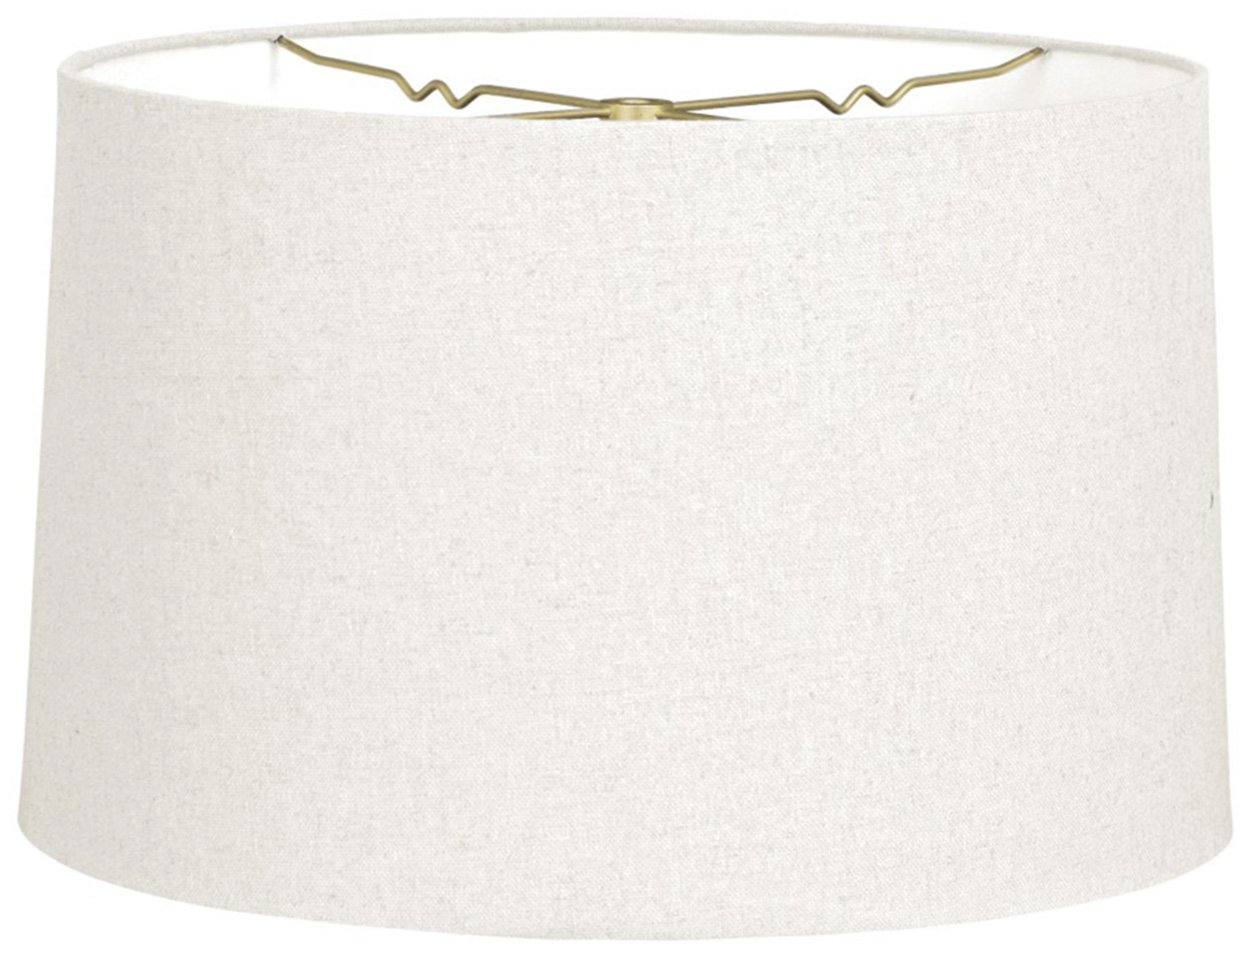 Royal Designs Shallow Drum Hardback Lamp Shade, Linen White, 17 x 18 x 11.5